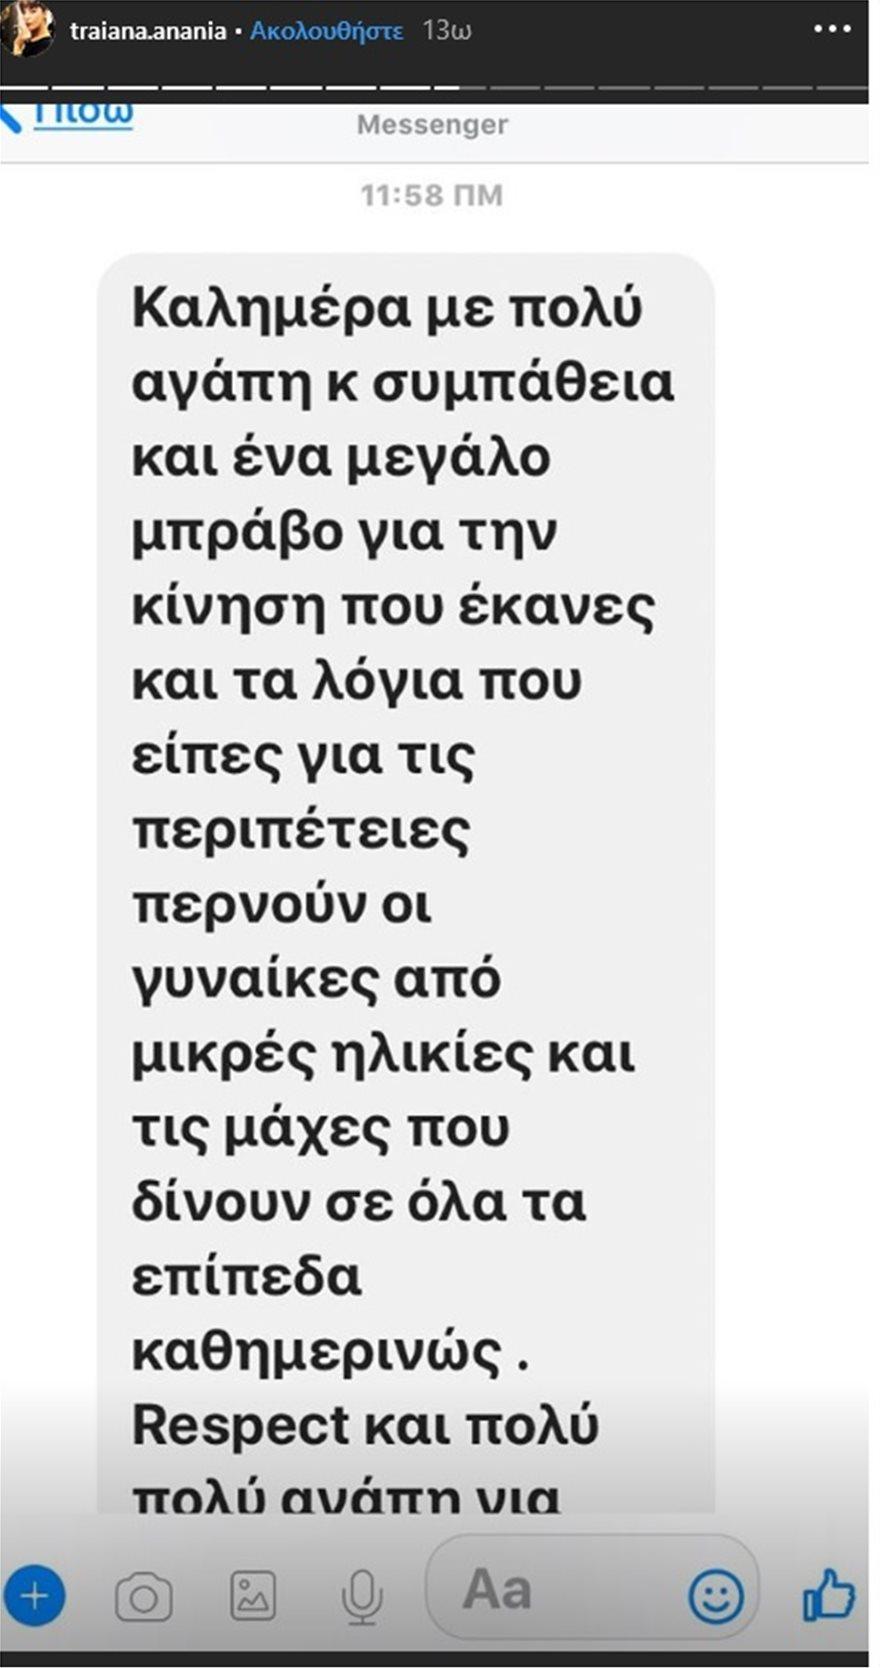 Anania9